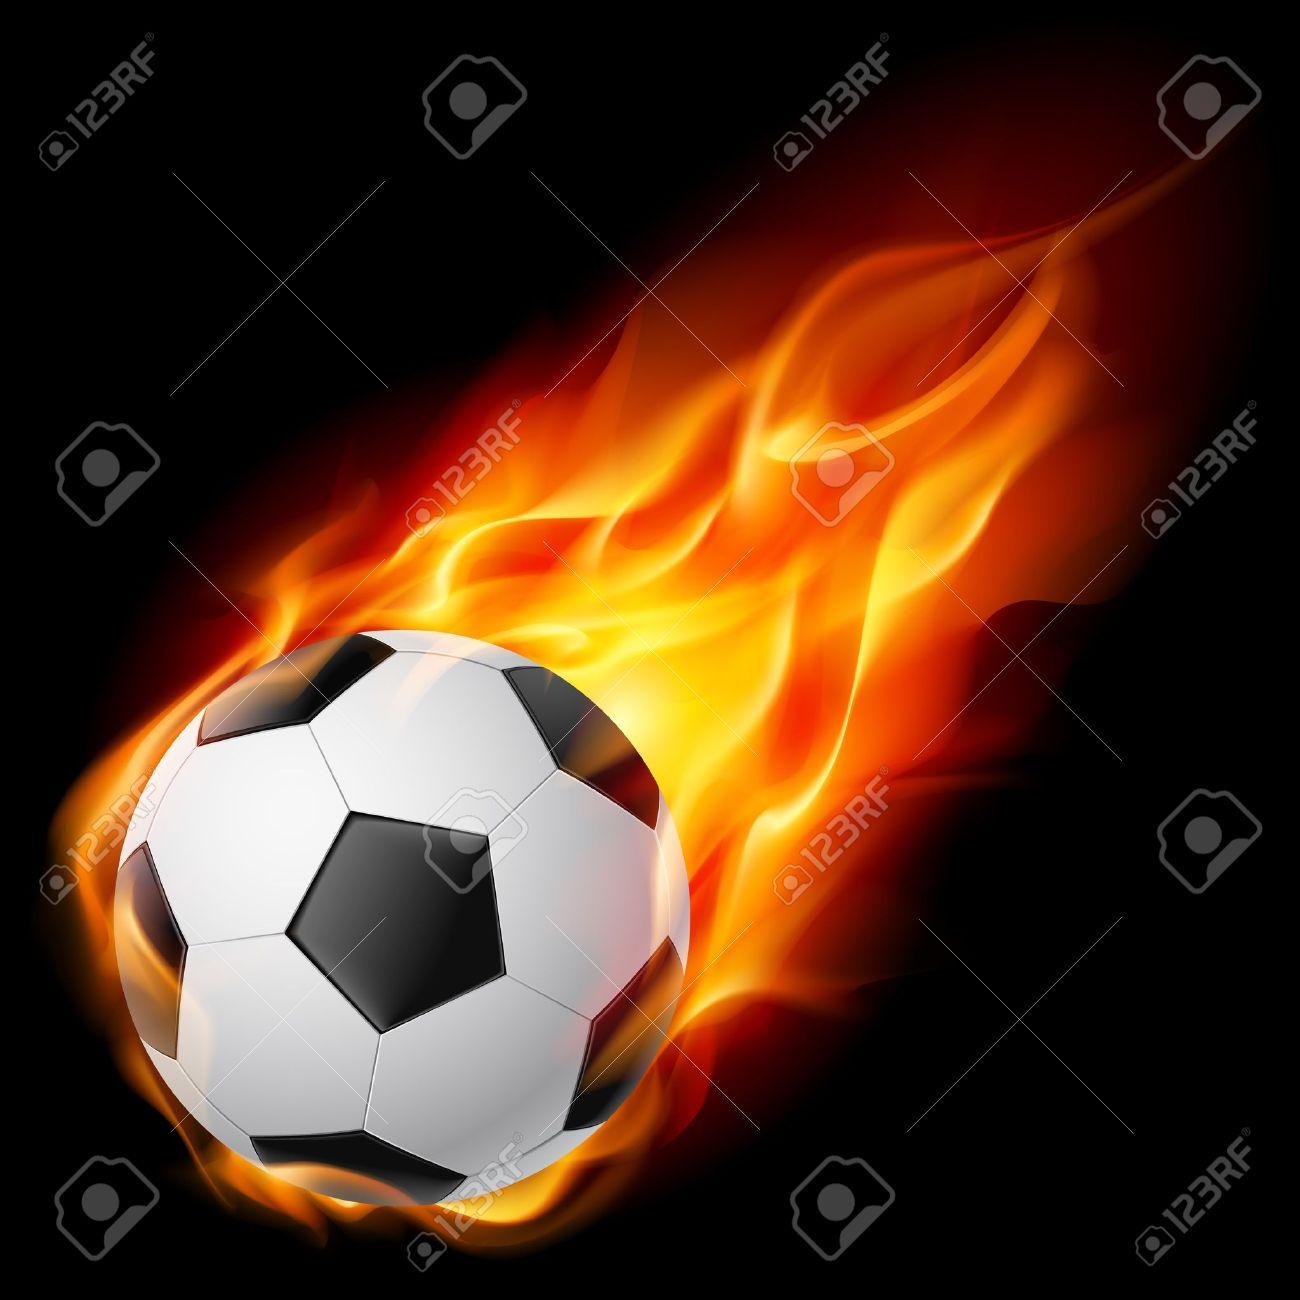 Soccer Ball on Fire. Illustration on black background Stock Vector - 10083098